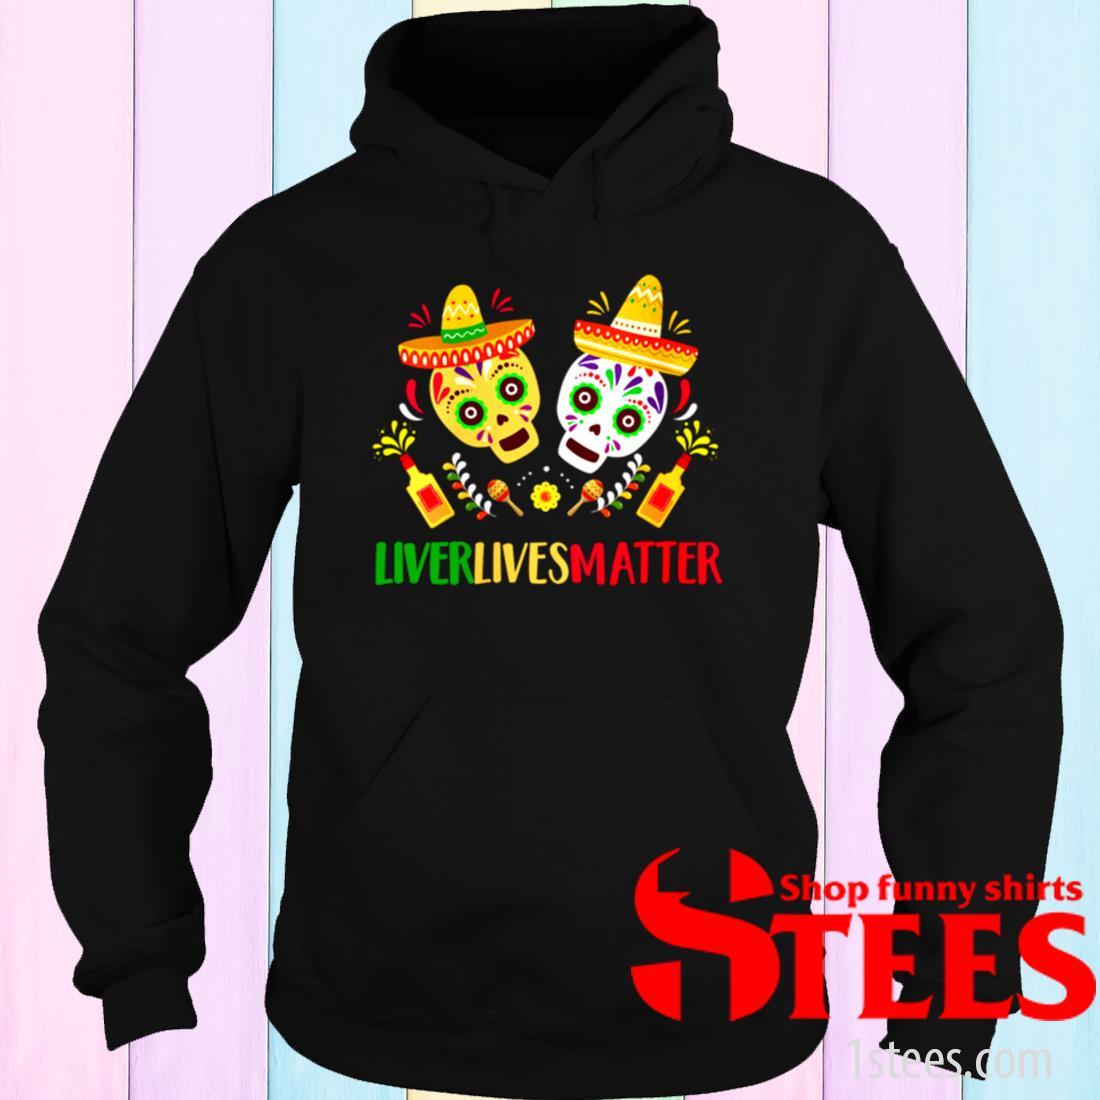 Womens Liver Lives Matter Mexican Cinco de Mayo Fiesta Party Shirt hoodie